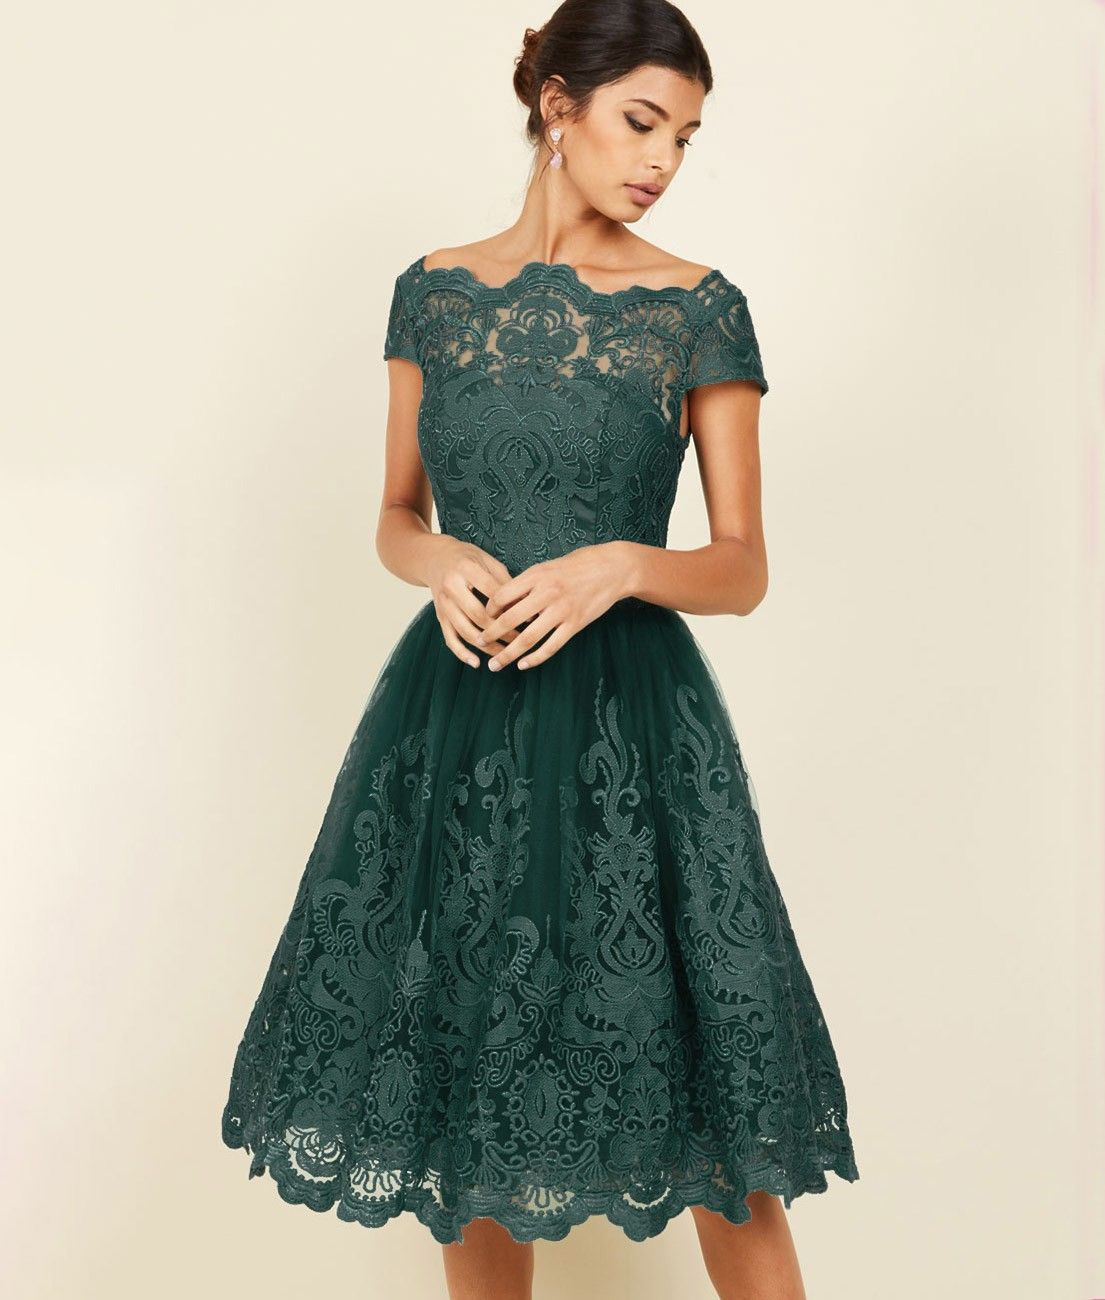 0d8c1e86db3d61 Sukienka butelkowa zieleń koronkowa rozkloszowana midi balowa ...